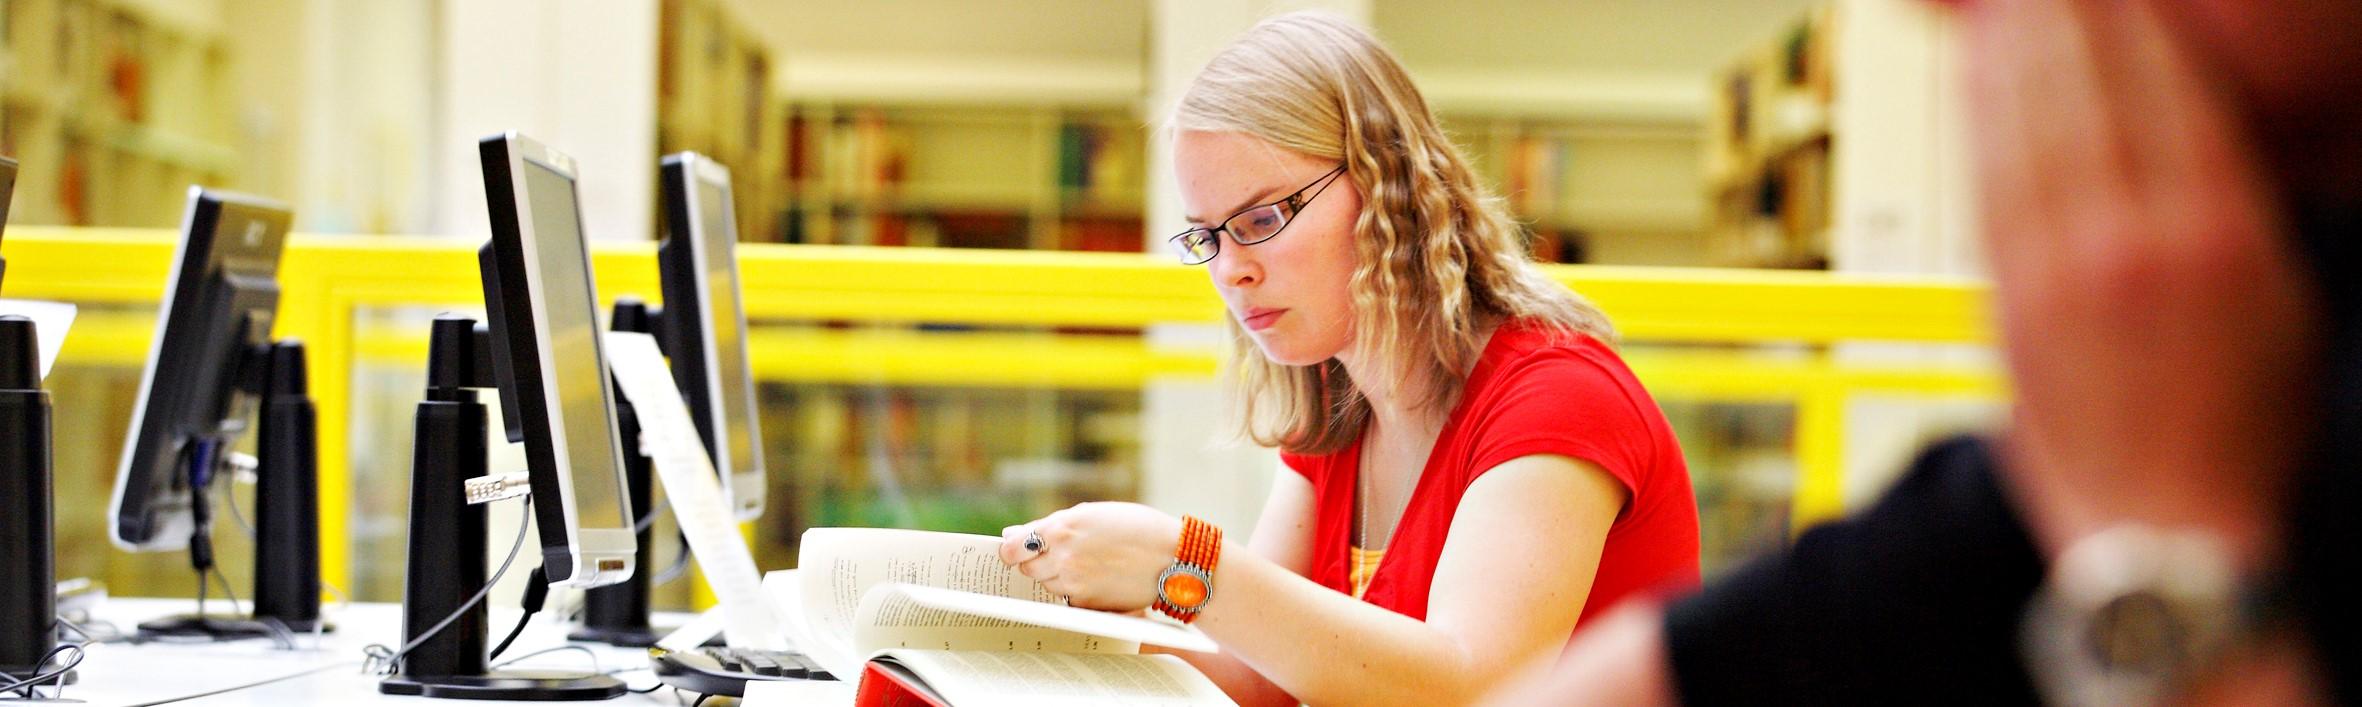 Kapea: Kirja ja kone kirjastossa